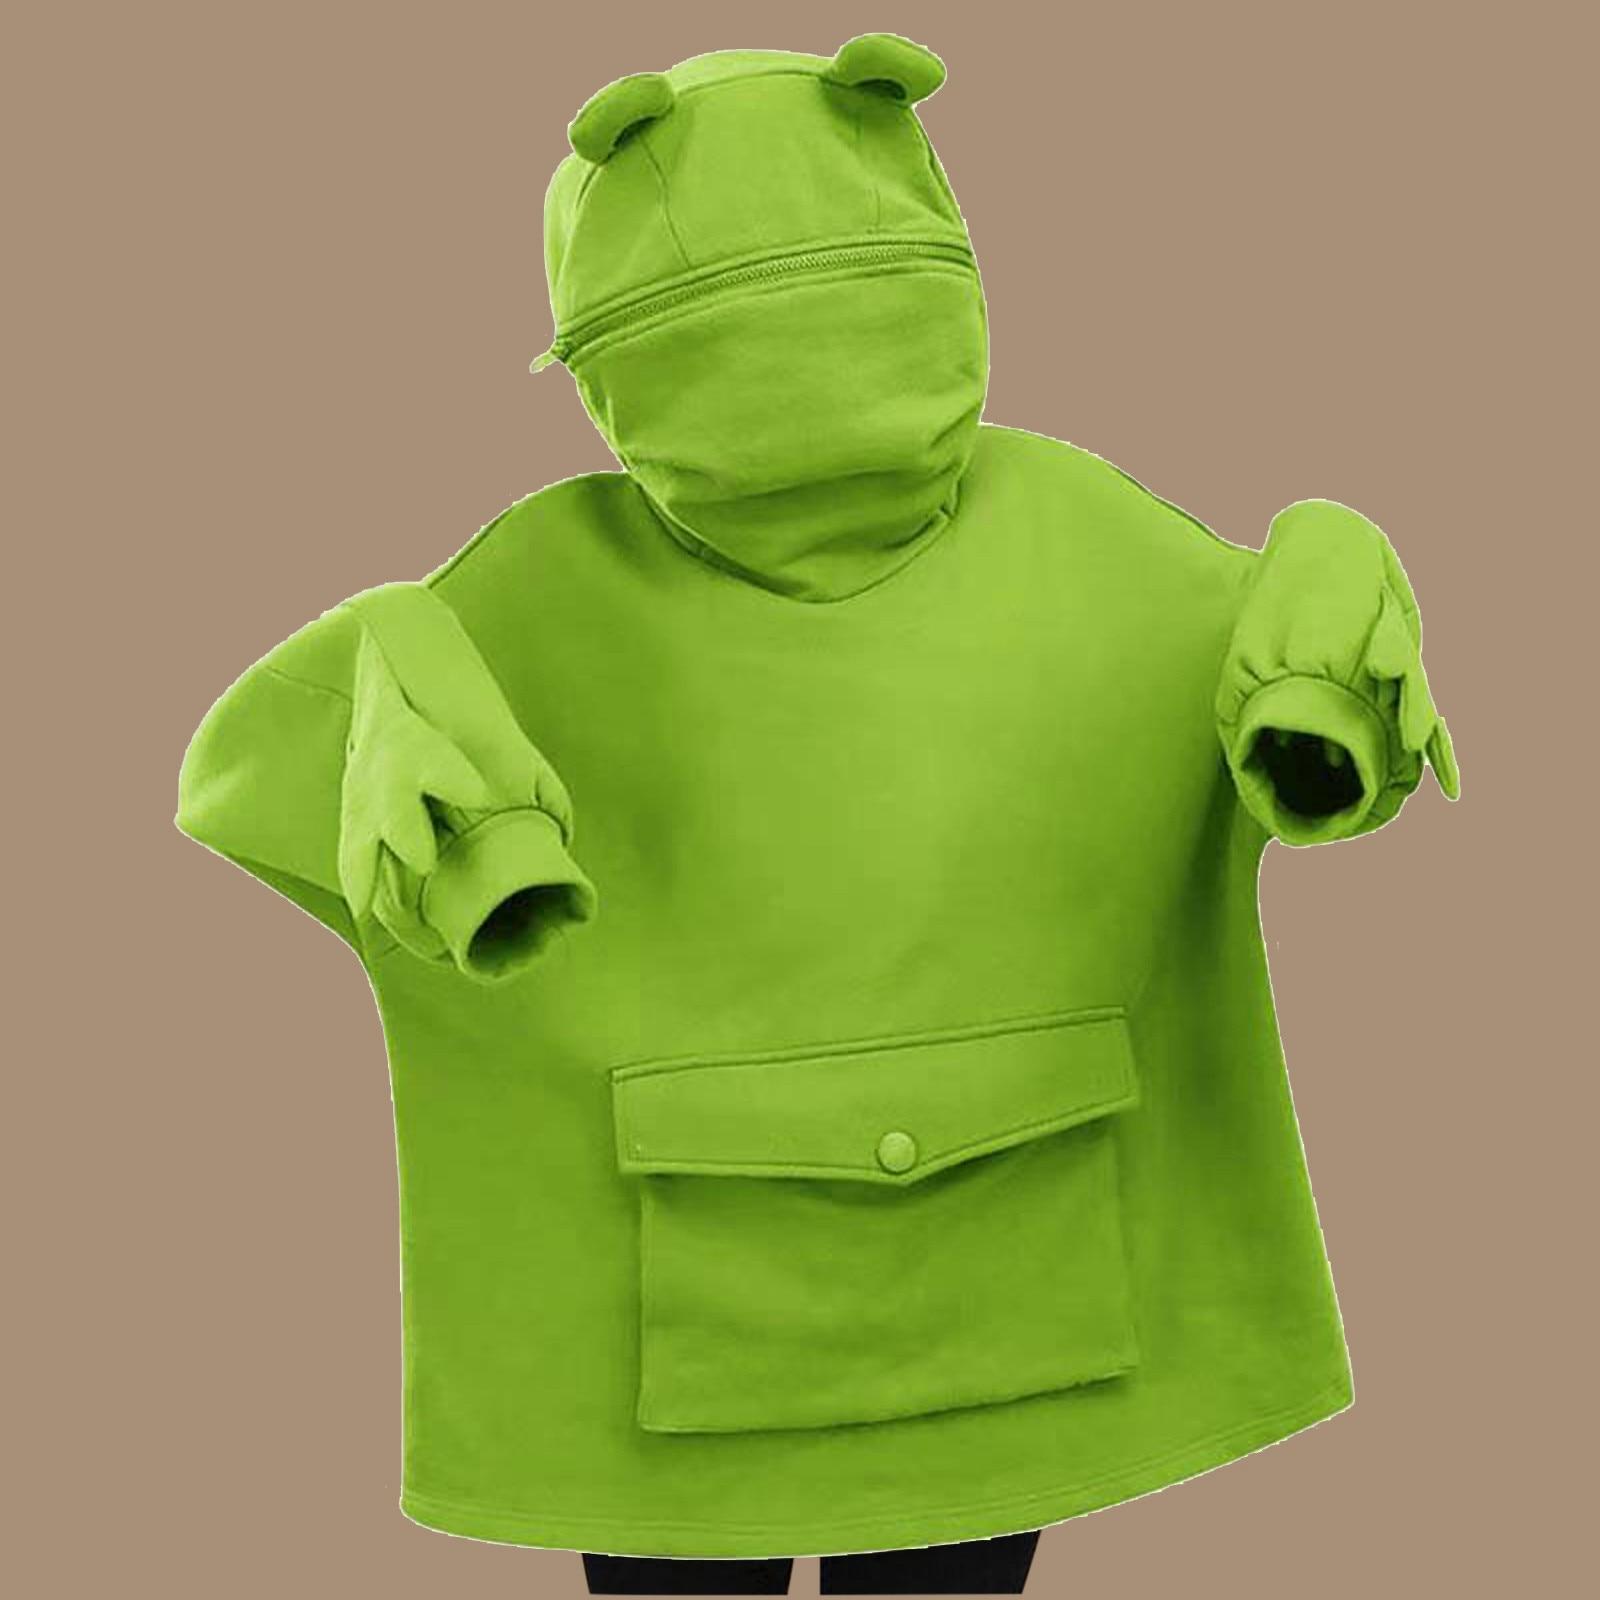 Kawaii Kleidung Sweatshirt Frauen Hoodies Süße Japan Top Kreative Nähte Drei-dimensional Nette Frösche Pullover Tasche Hoodies